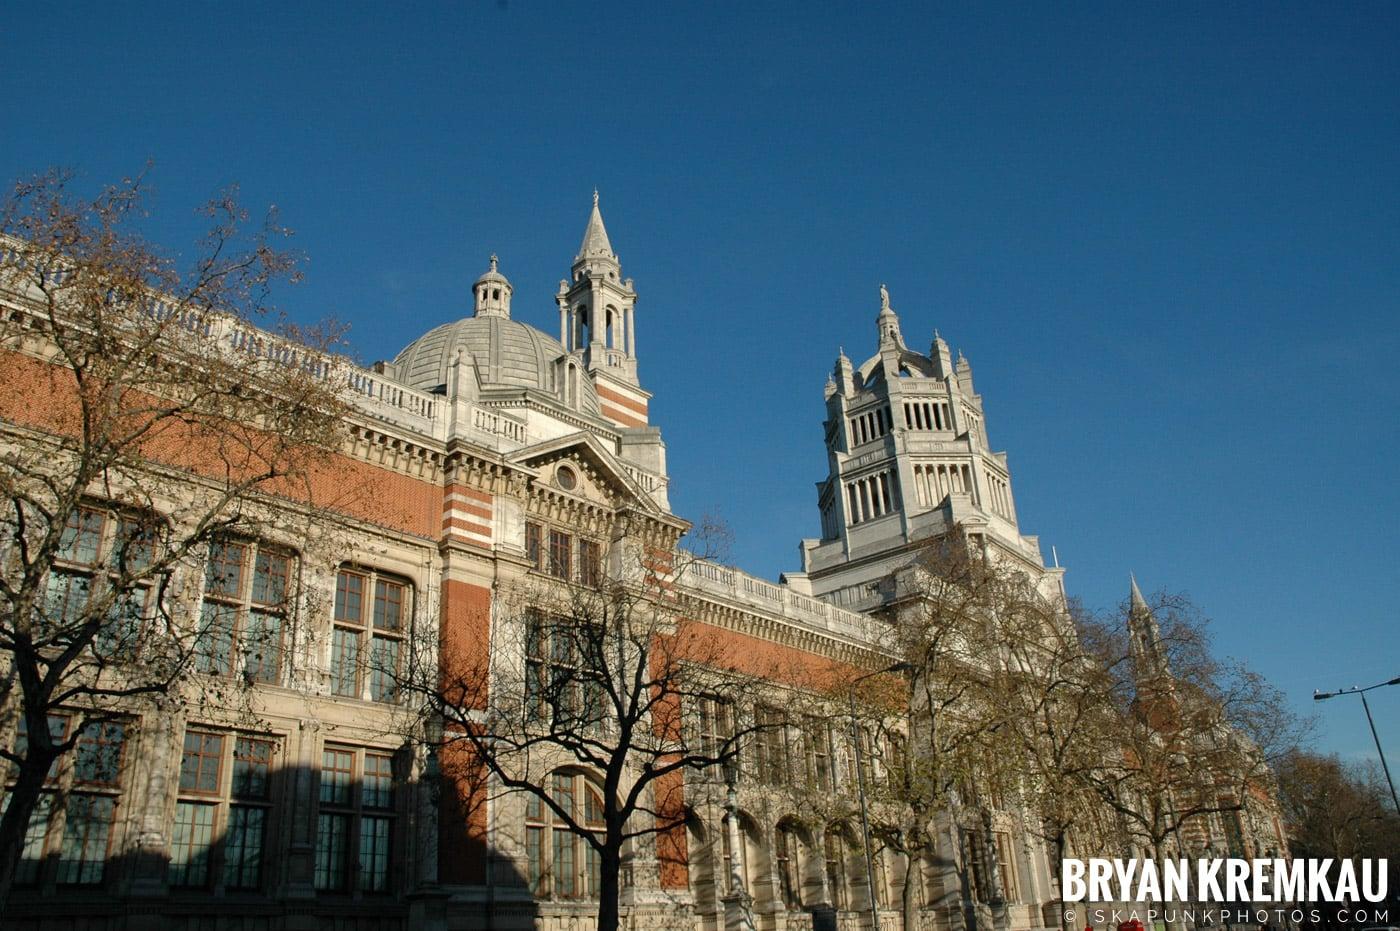 London, England - Day 3 - 12.18.05 (41)